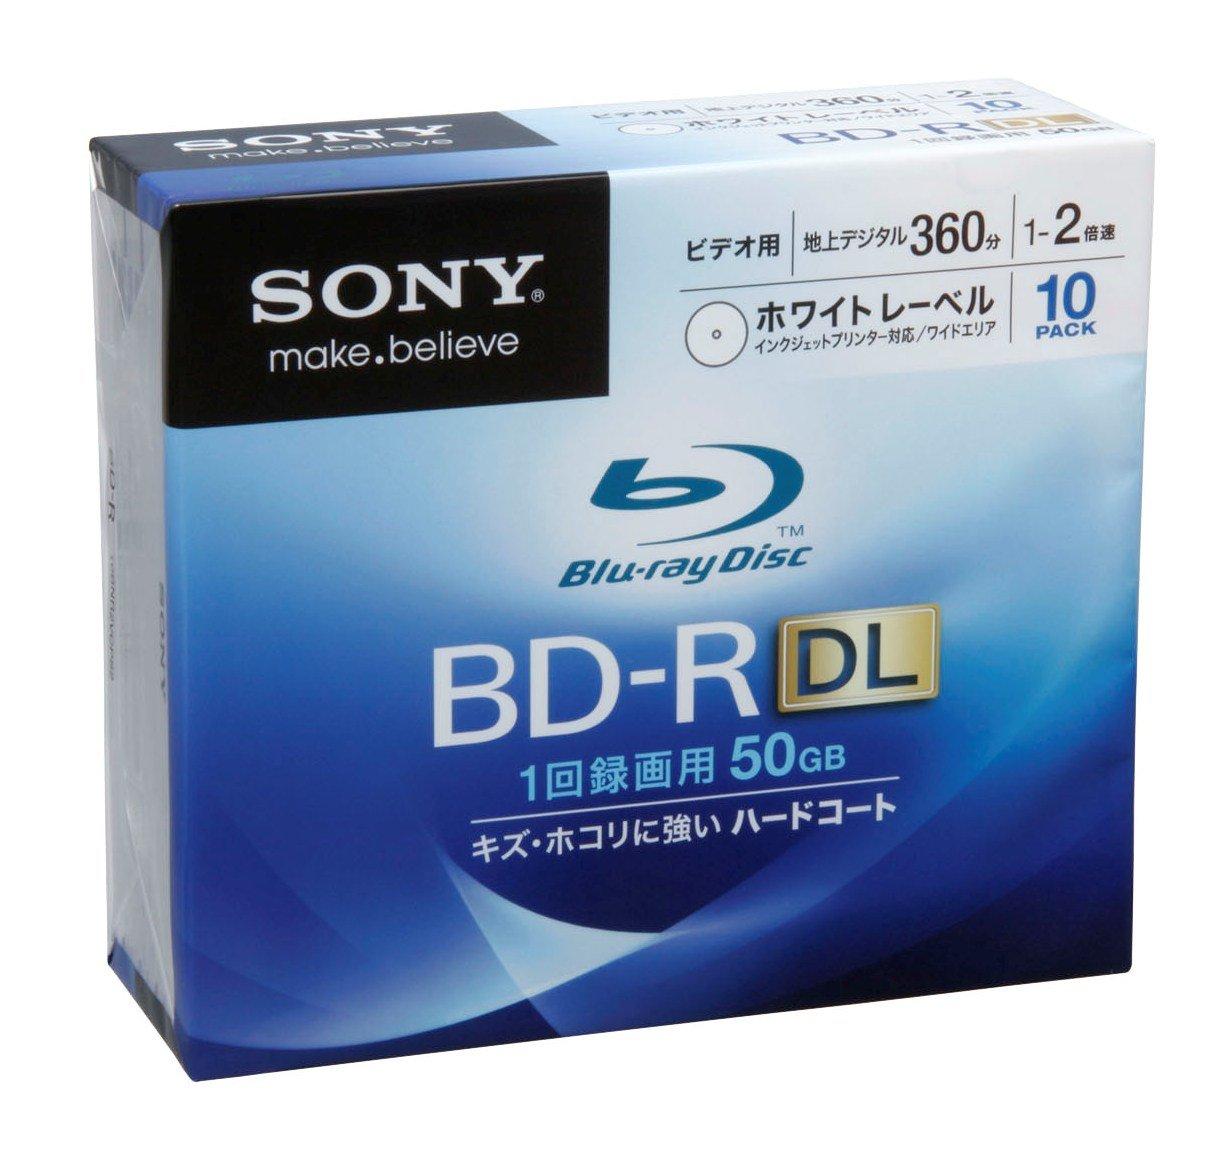 Sony Blu-ray Disc 10 Pack - 50GB 2x Speed BD-R DL Version 2010 - White Inkjet Printable